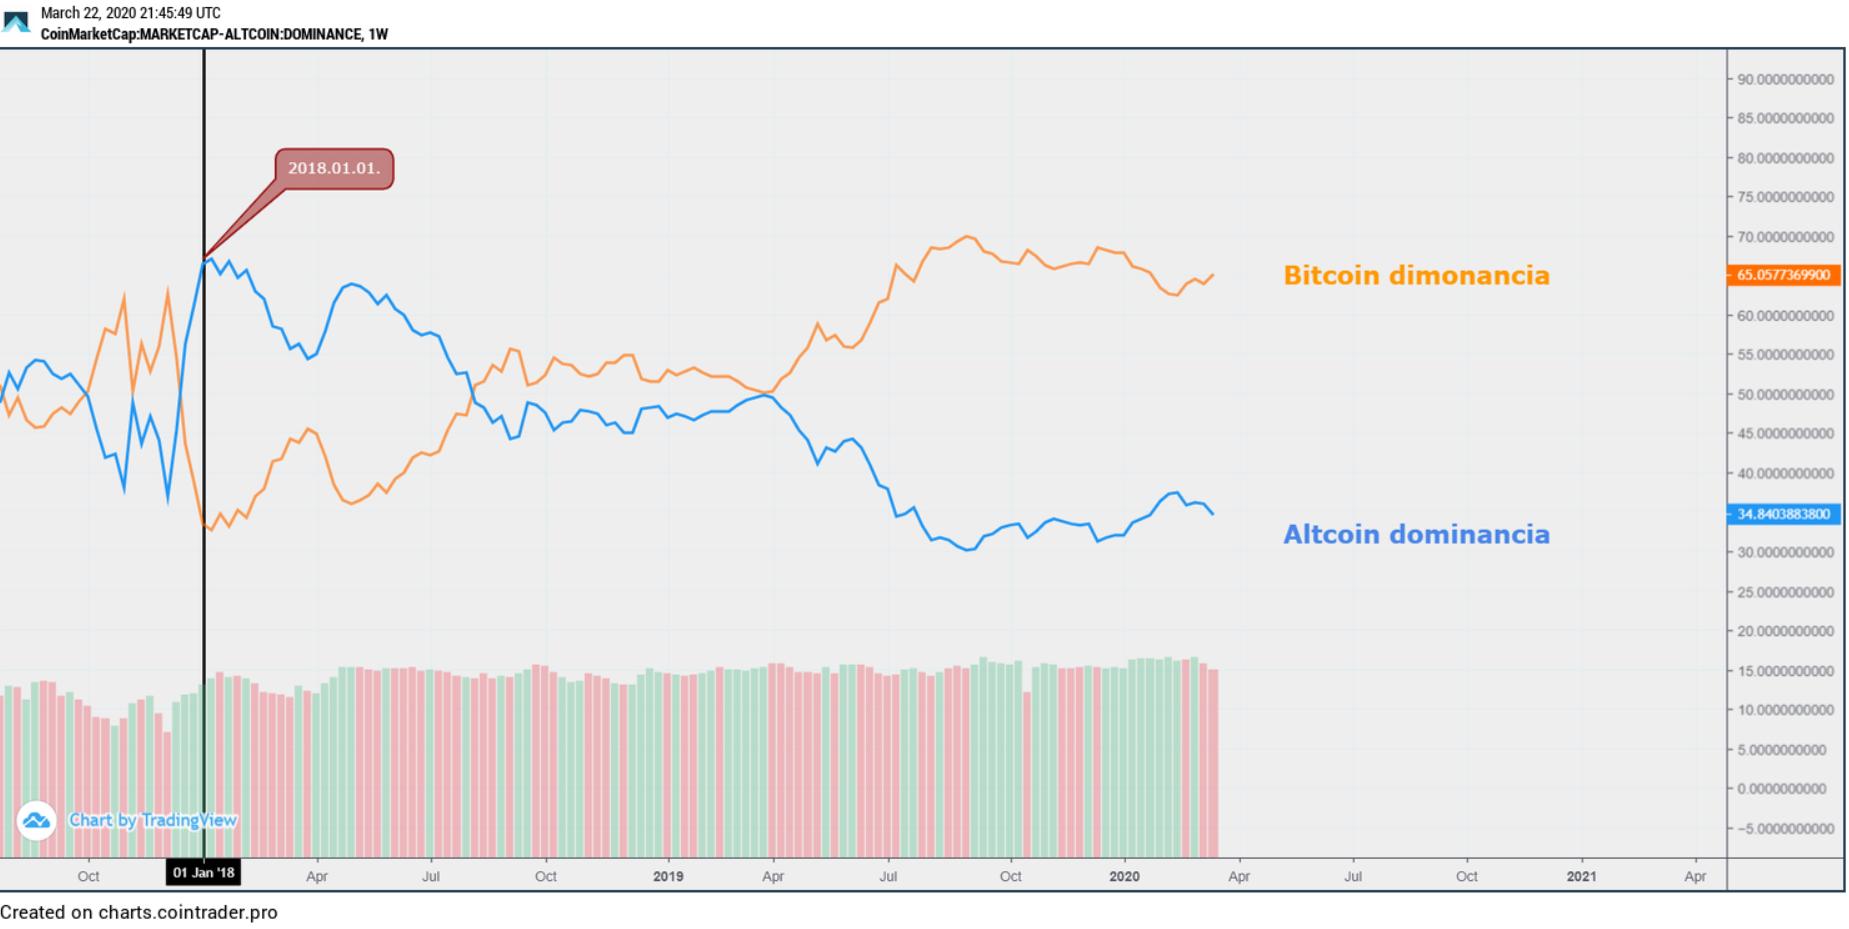 Bitcoin - altcoin dominancia